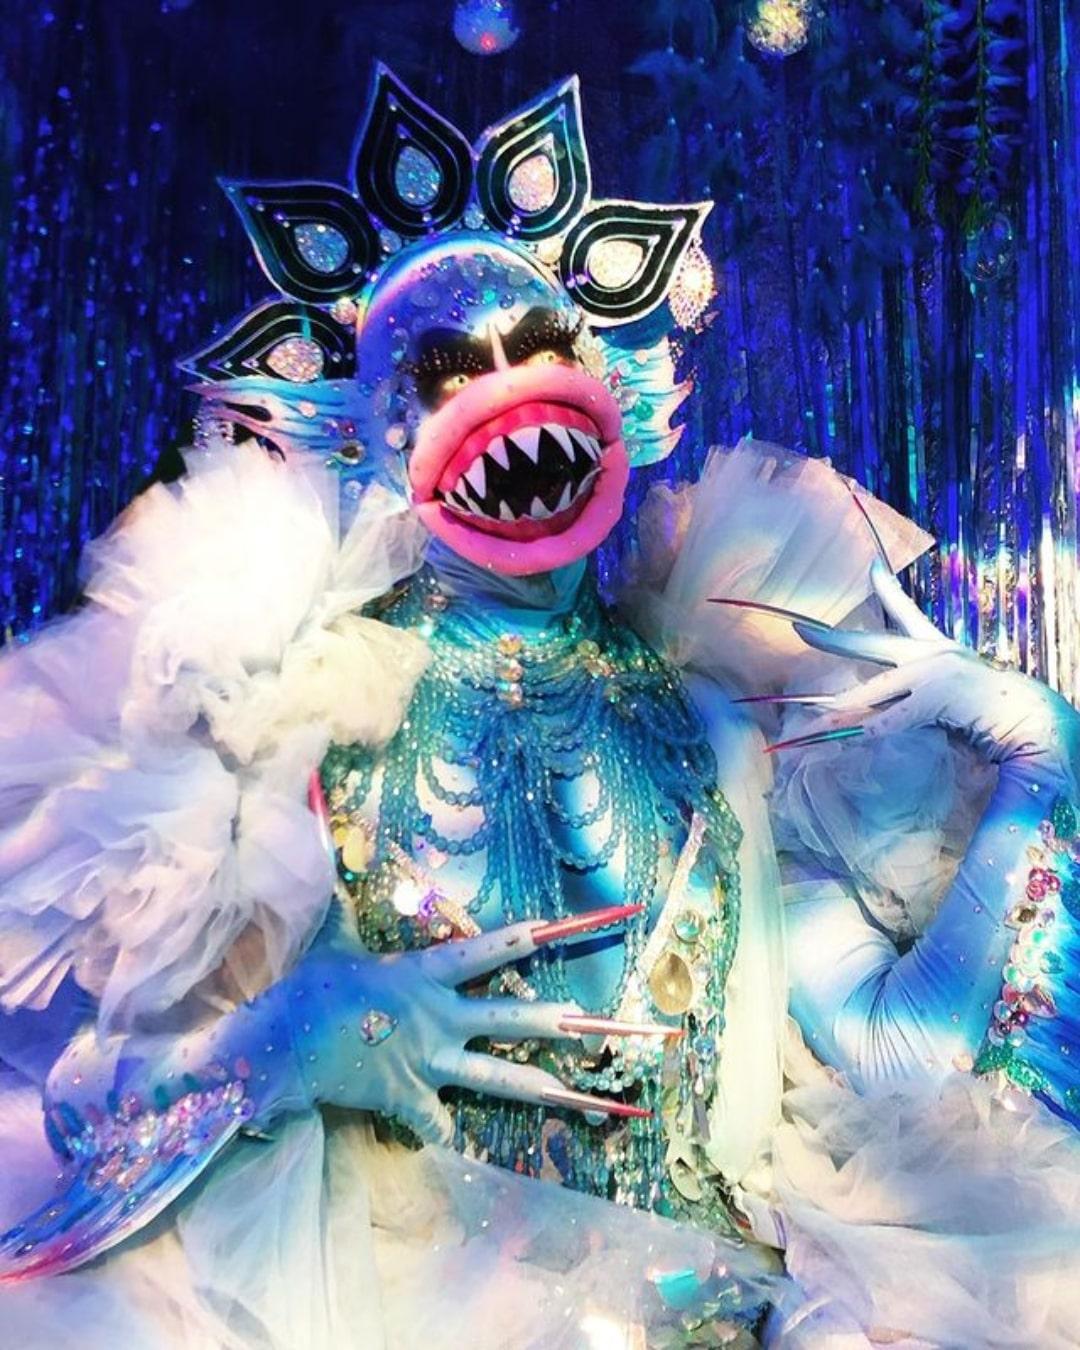 Conoce a Charity Kase, la estrella drag londinense que rompe la Internet con looks alucinantes